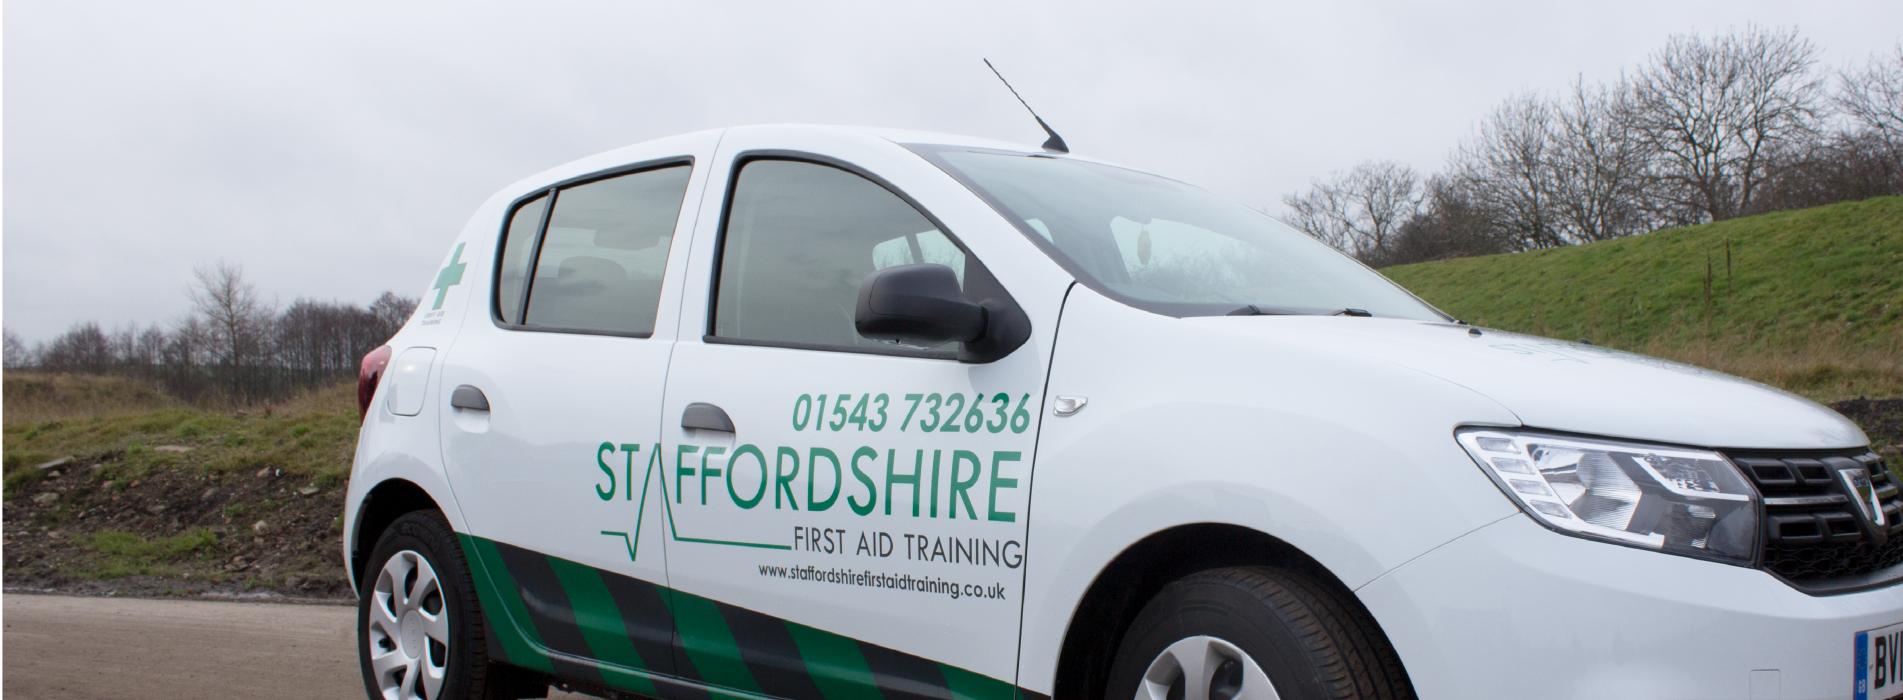 nottingham first aid training